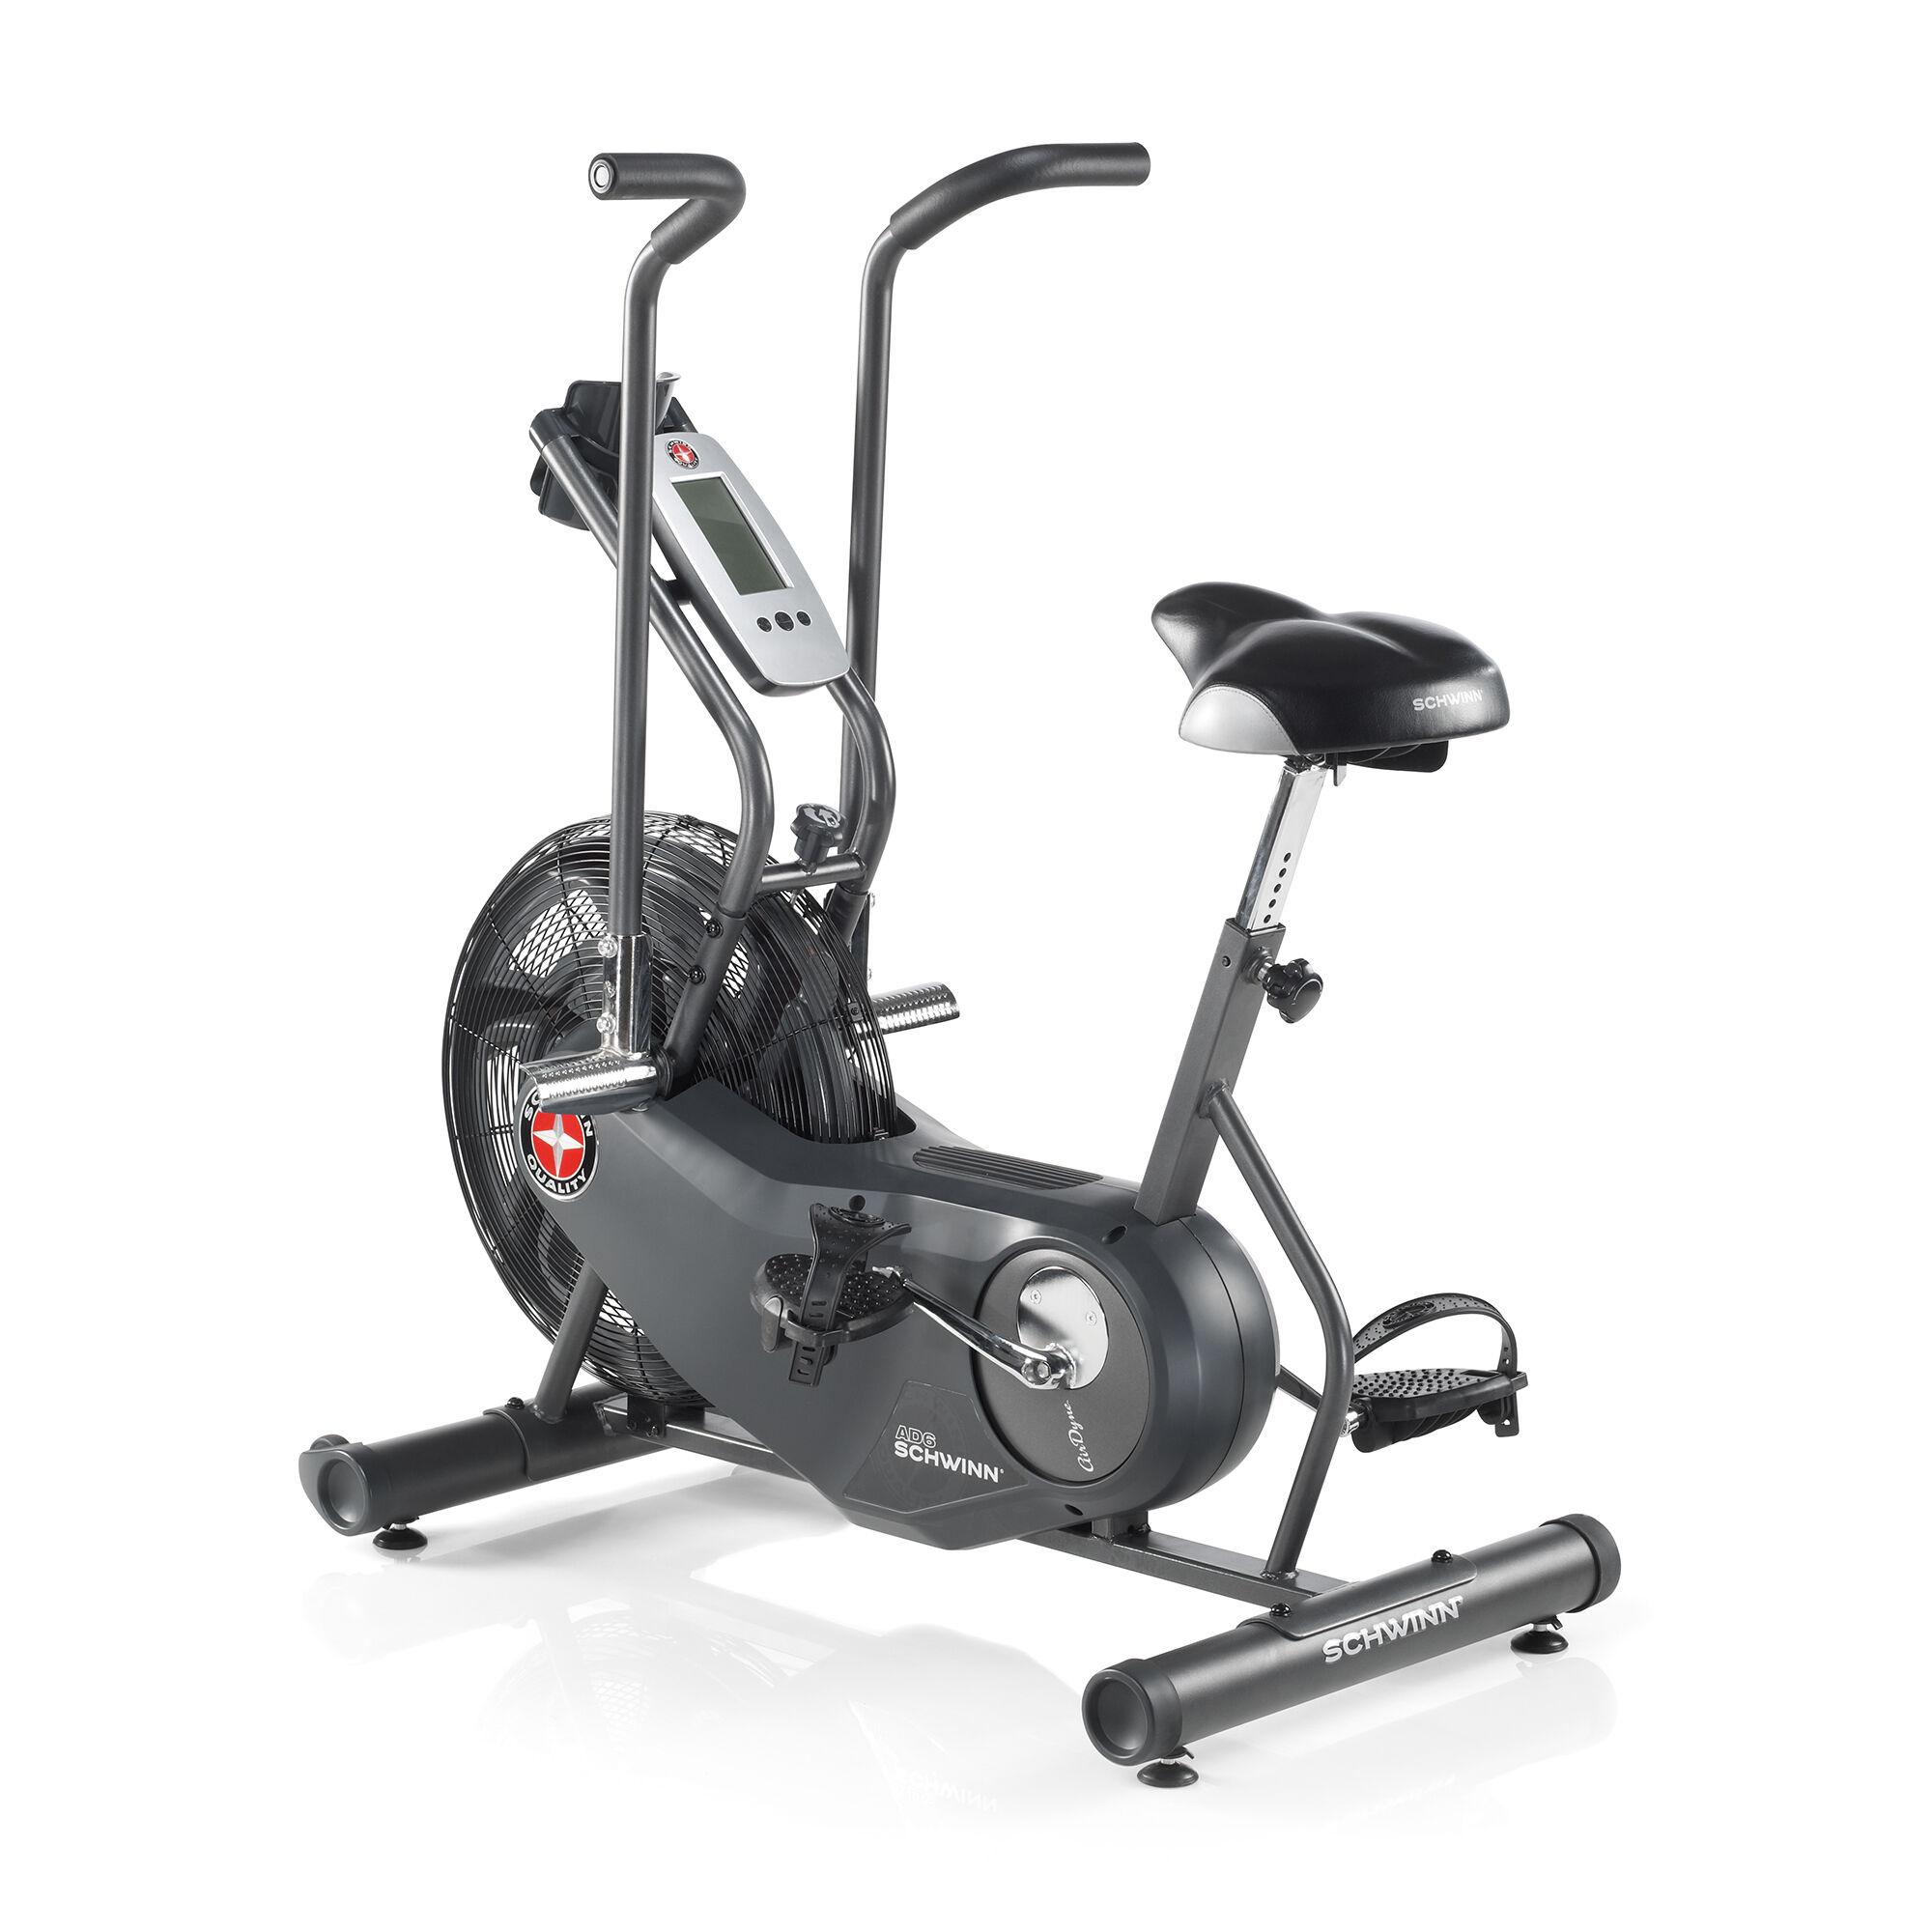 AD4 SCHWINN PEDALS FOR AIRDYNE EXERCISE BIKE R//L